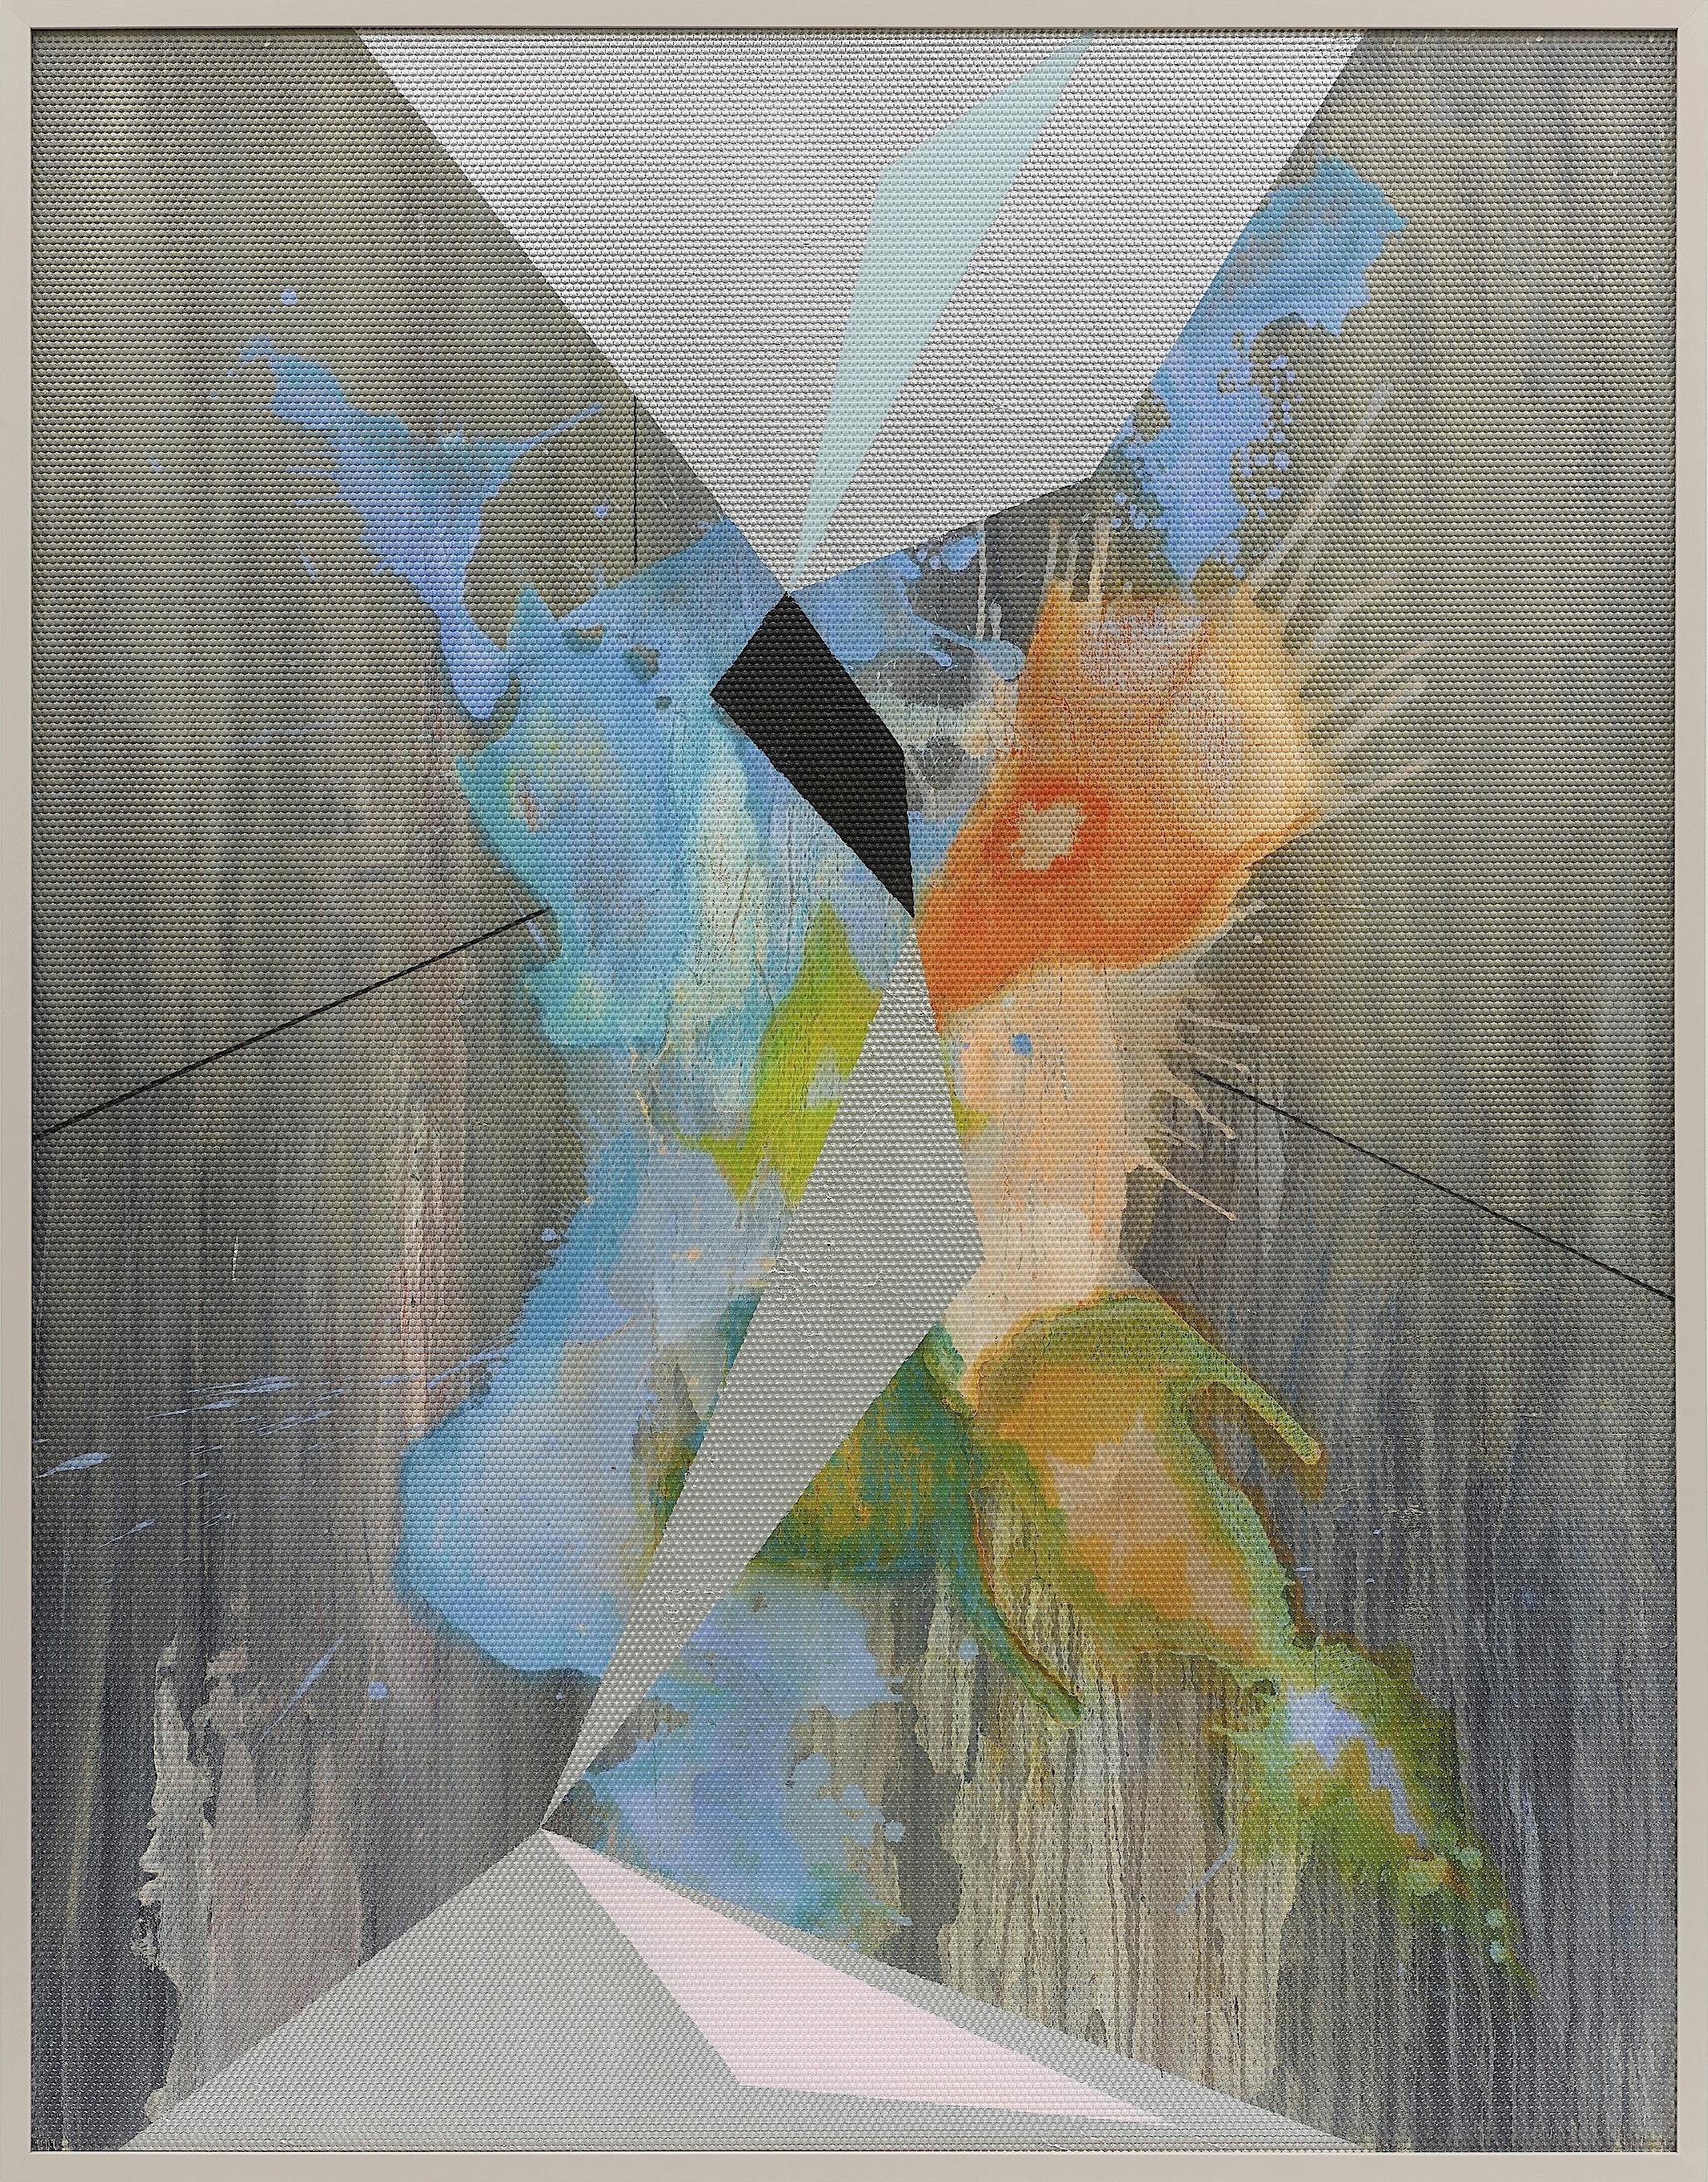 Eidolon / Part IV,  2012 Oil and acrylic on canvas beneath textured Plexiglas 180 x 140 cm (71 x 55 in)